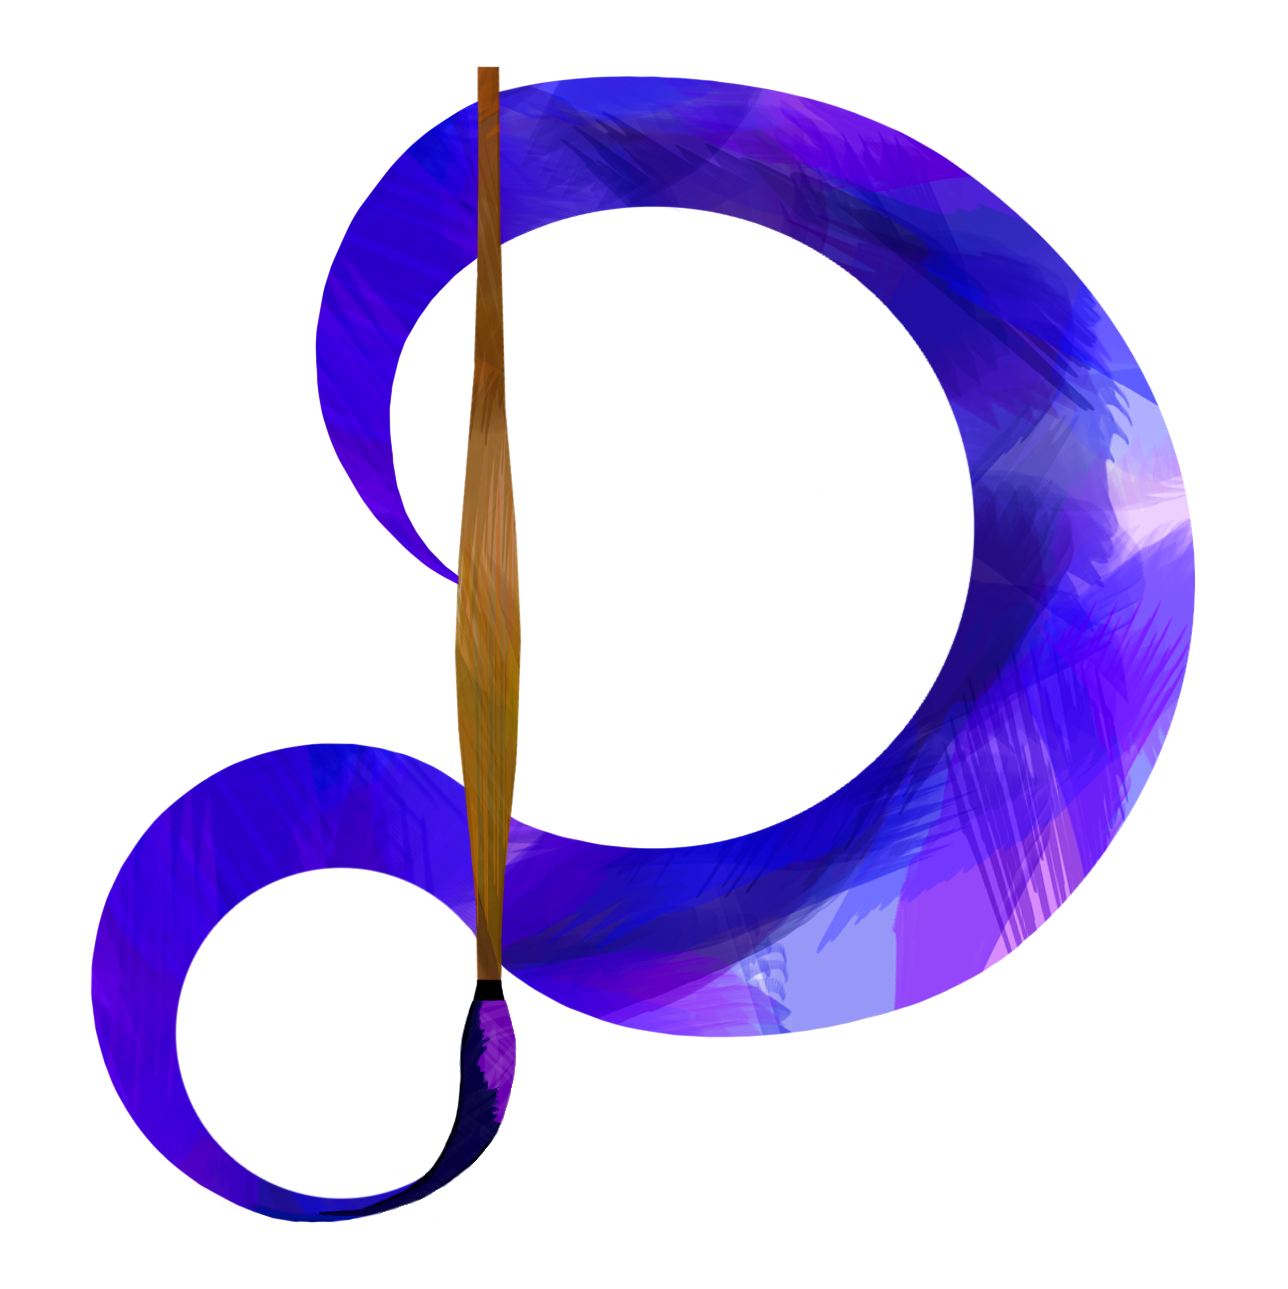 DenneDesign